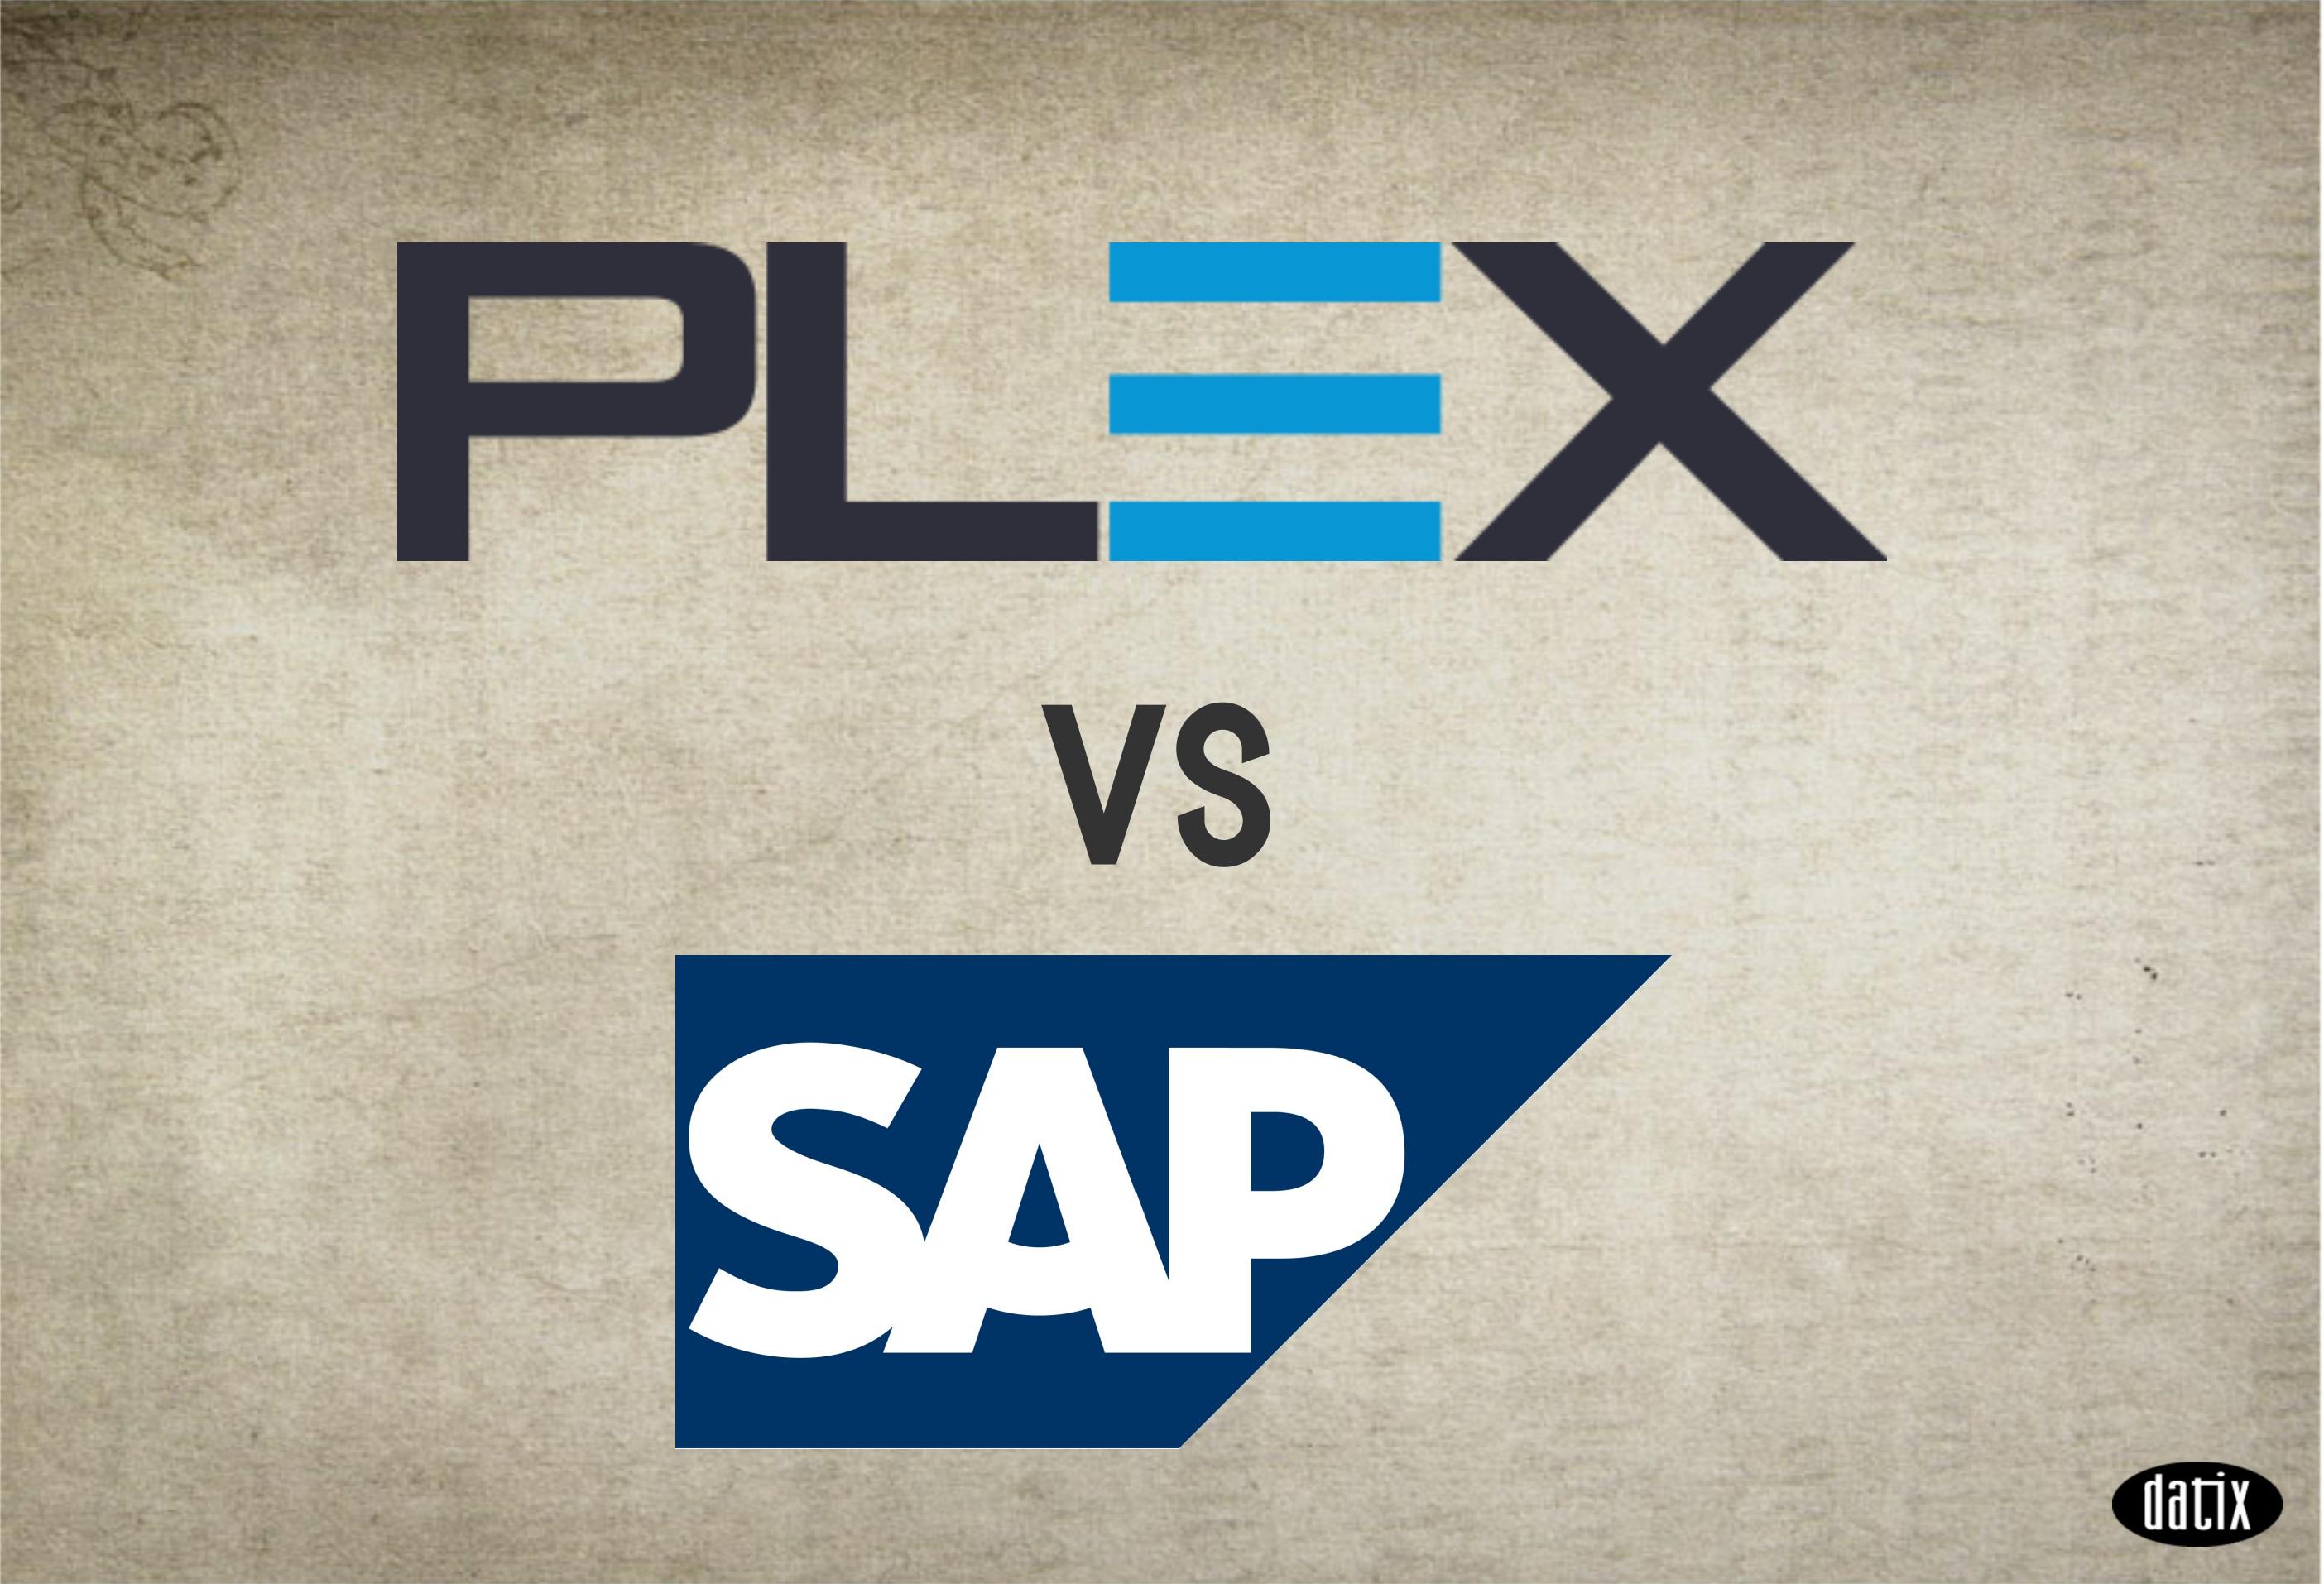 sap vs plex